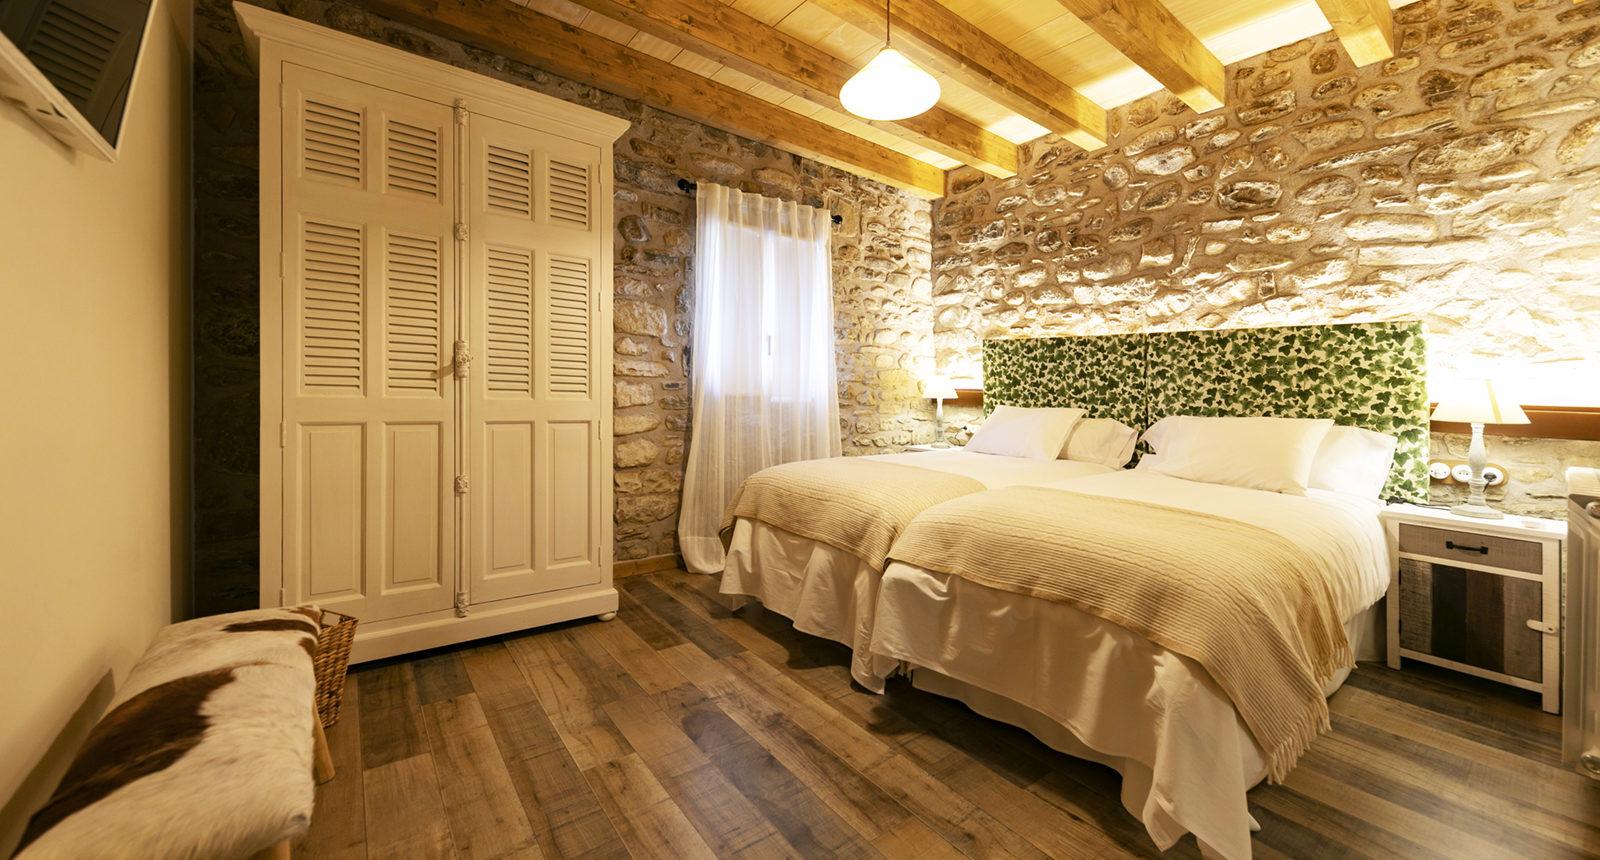 habitación doble con baño554